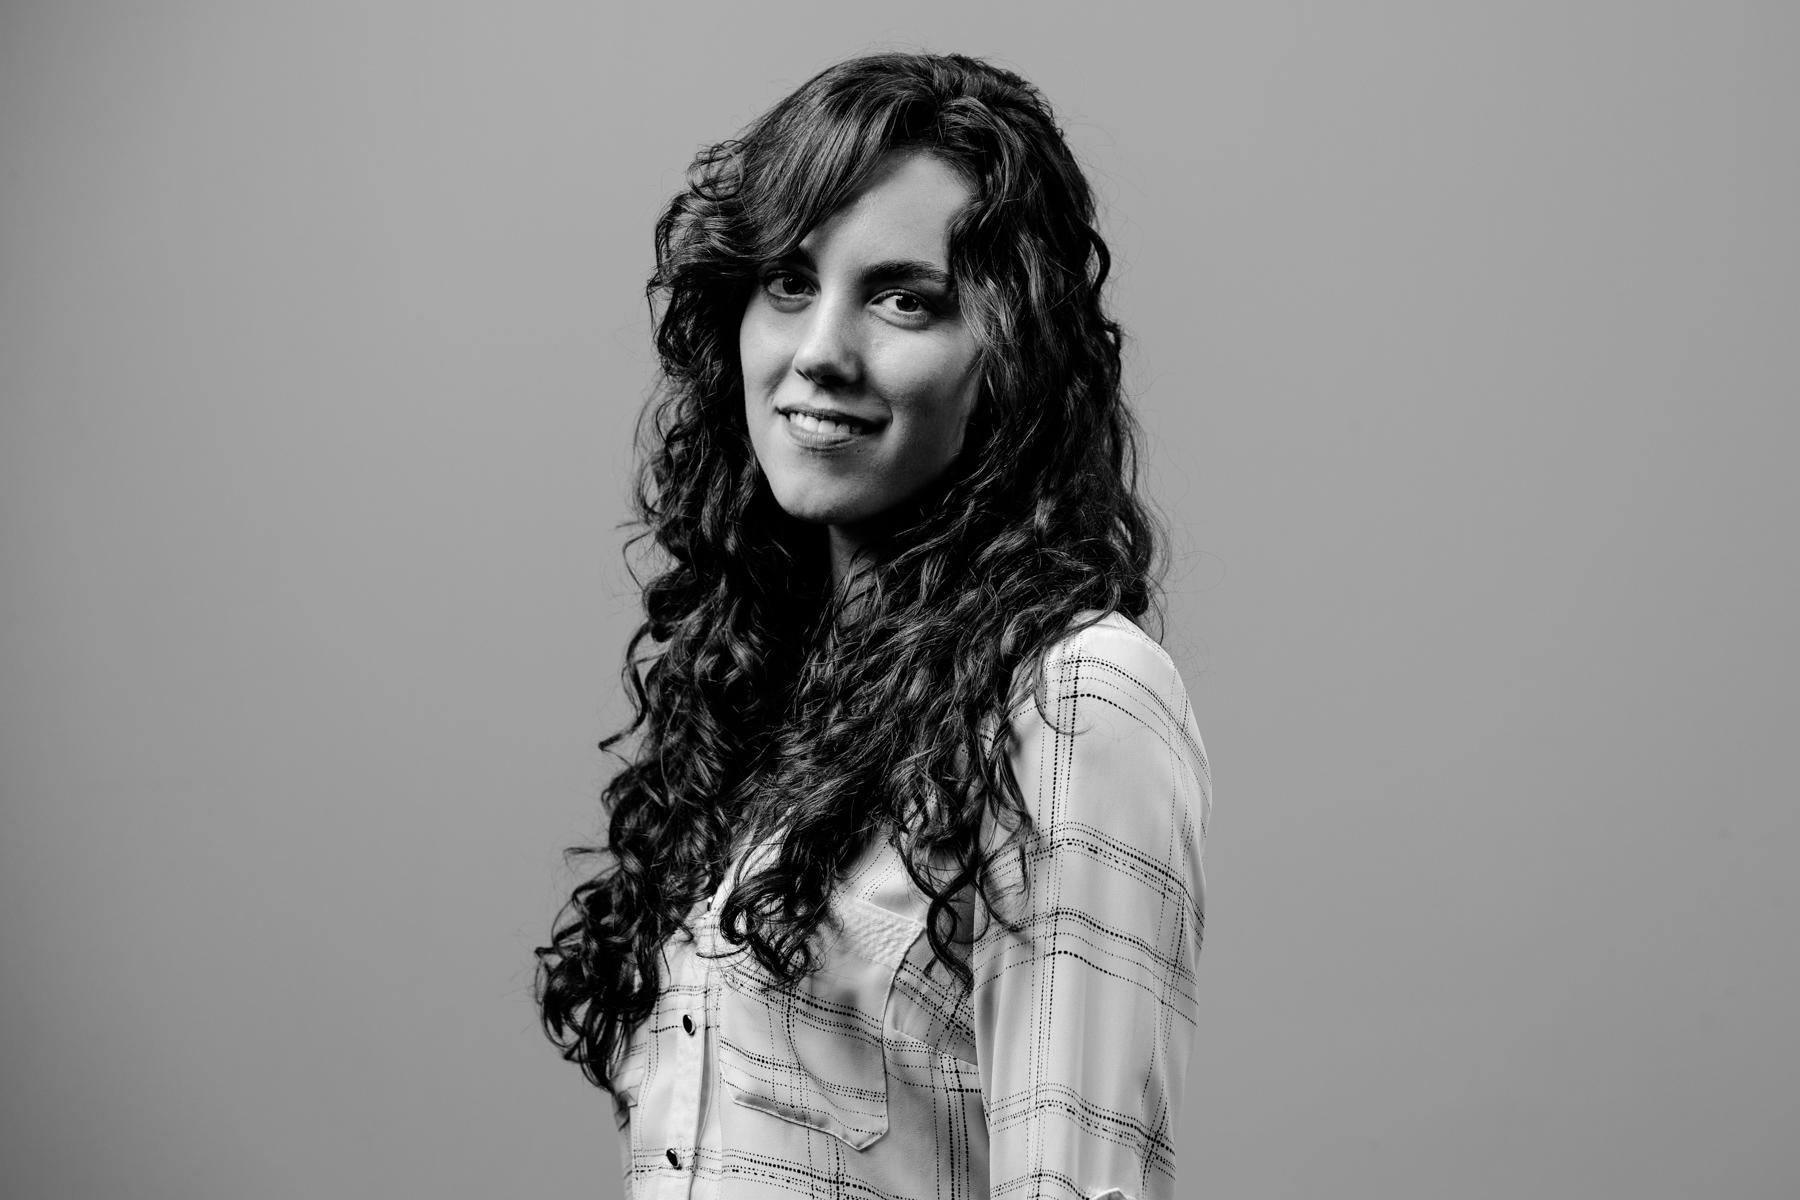 Rachael Ogle